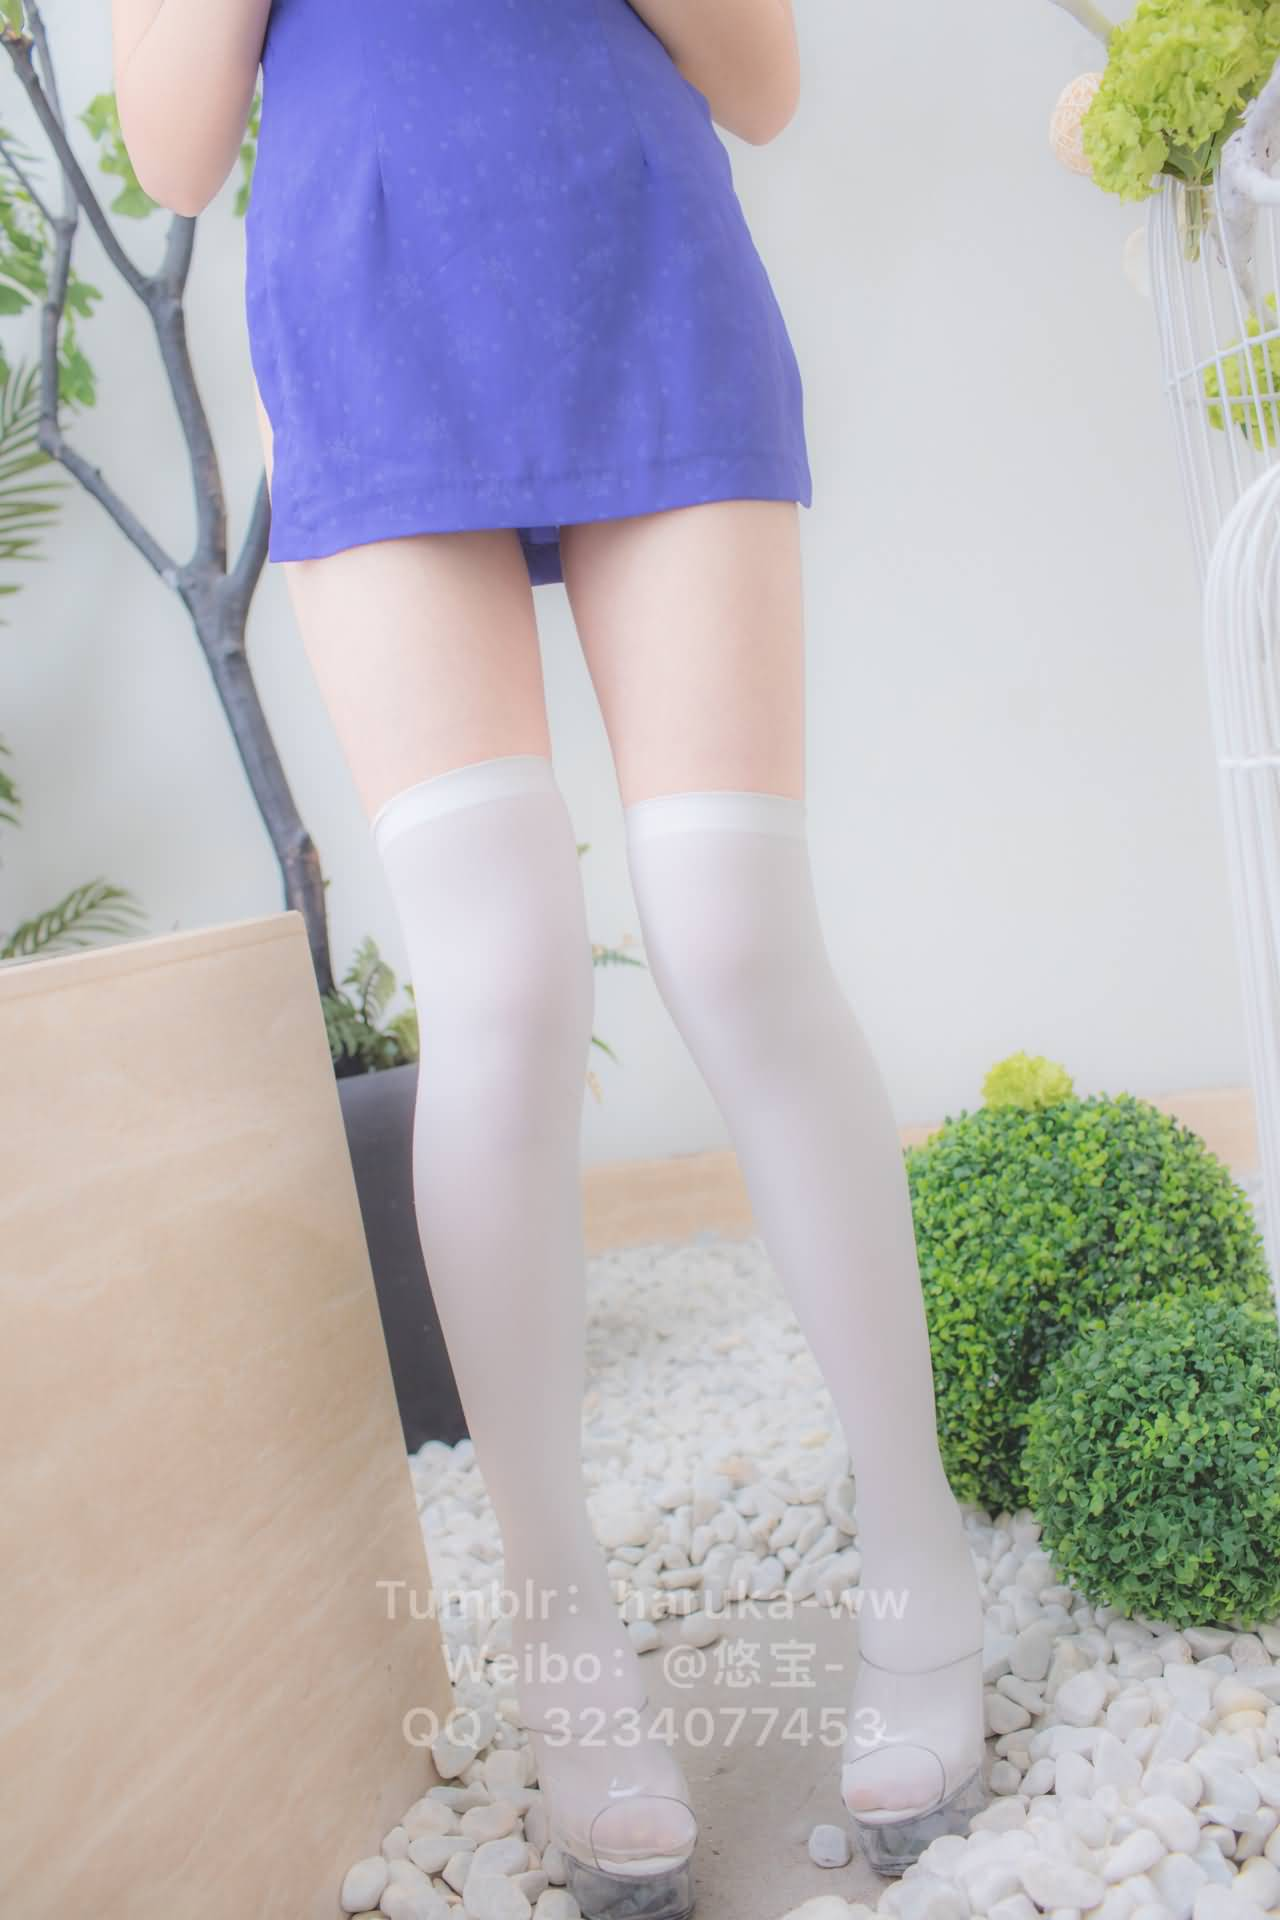 mfpqth - Young japanese school girl white stockings cheongsam 悠宝三岁 白丝旗袍